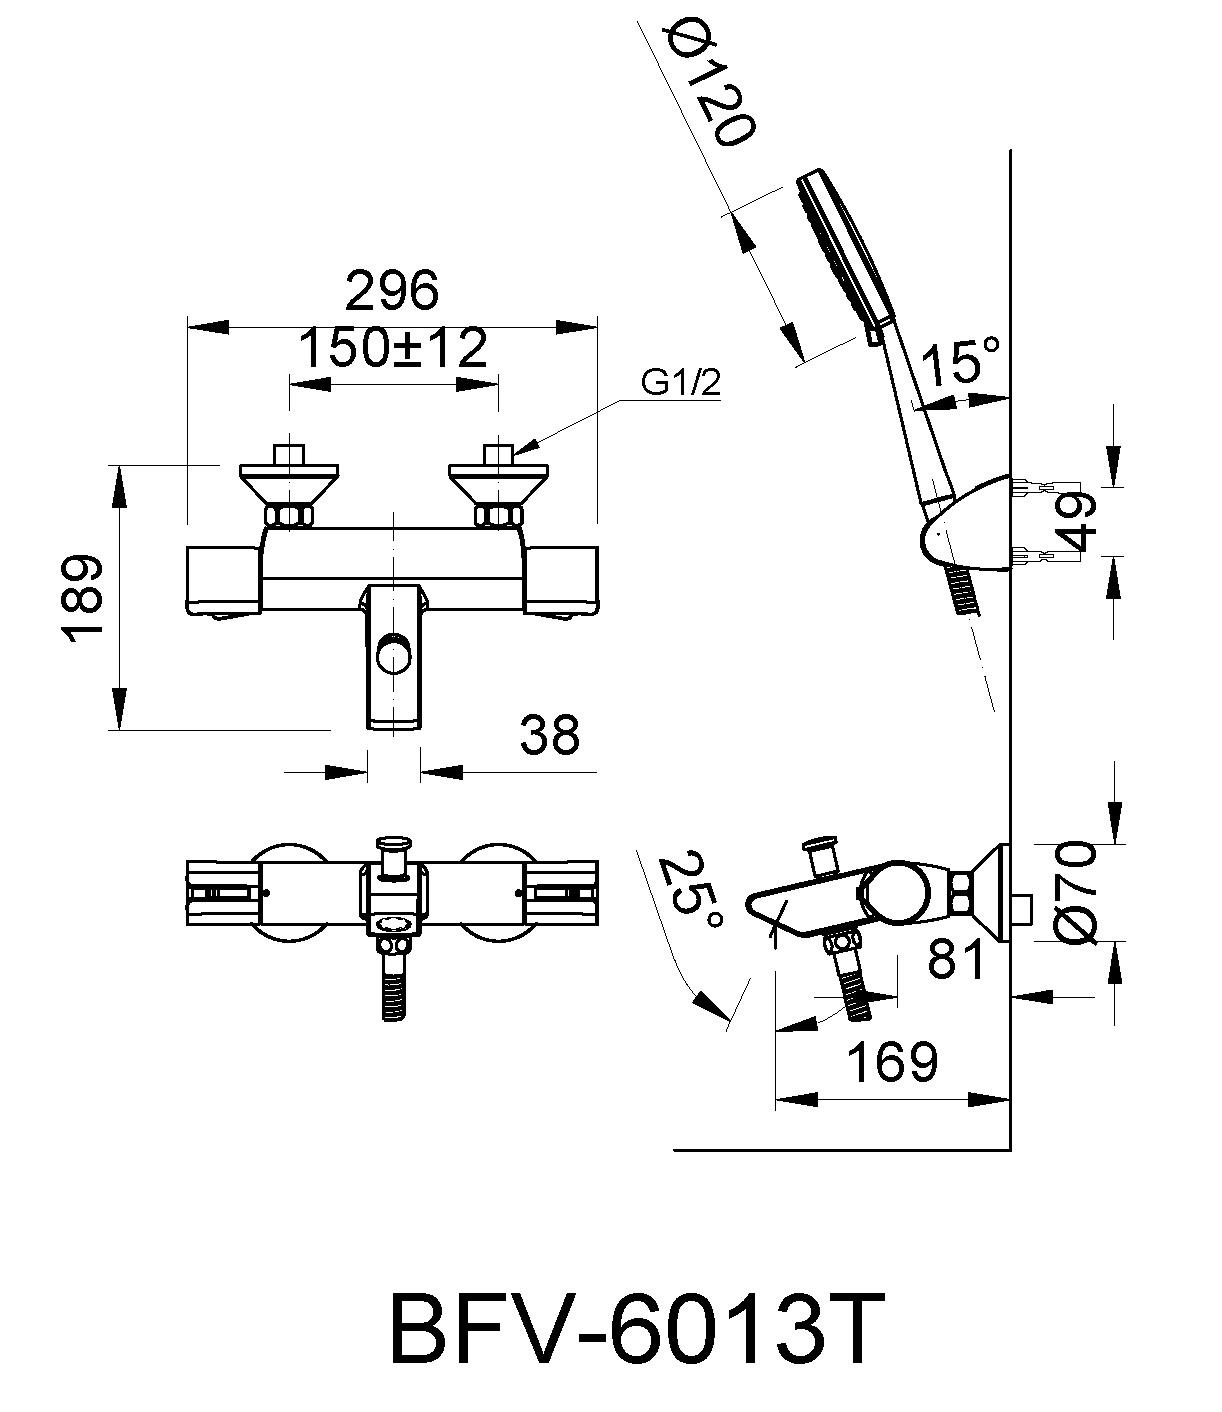 Bản vẽ kỹ thuật Inax BFV-6013T